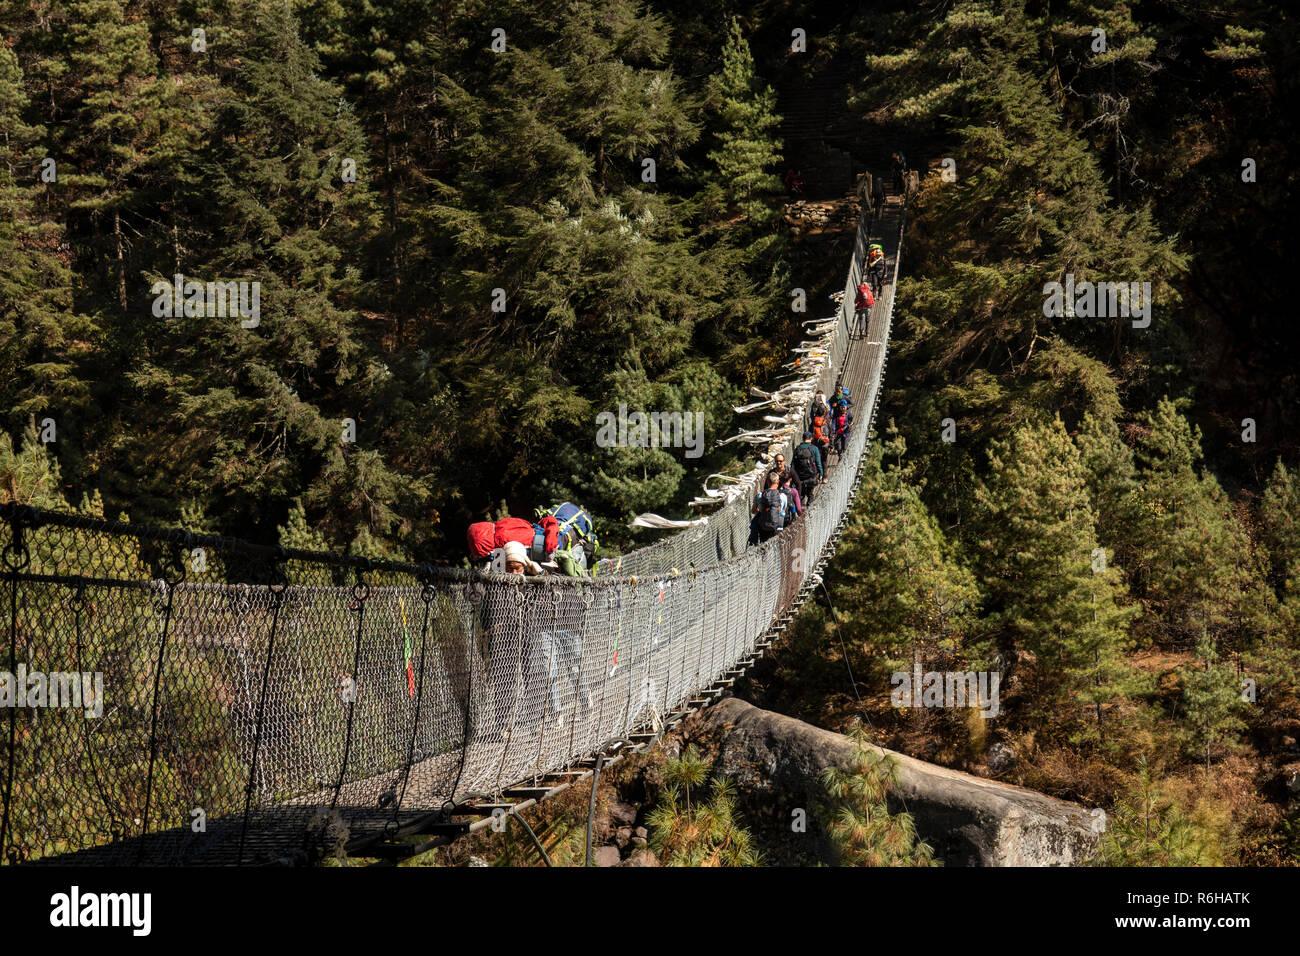 Nepal, Jorsale (Thumbug), line of people crossing metal suspension bridge over Dudh Khosi river - Stock Image